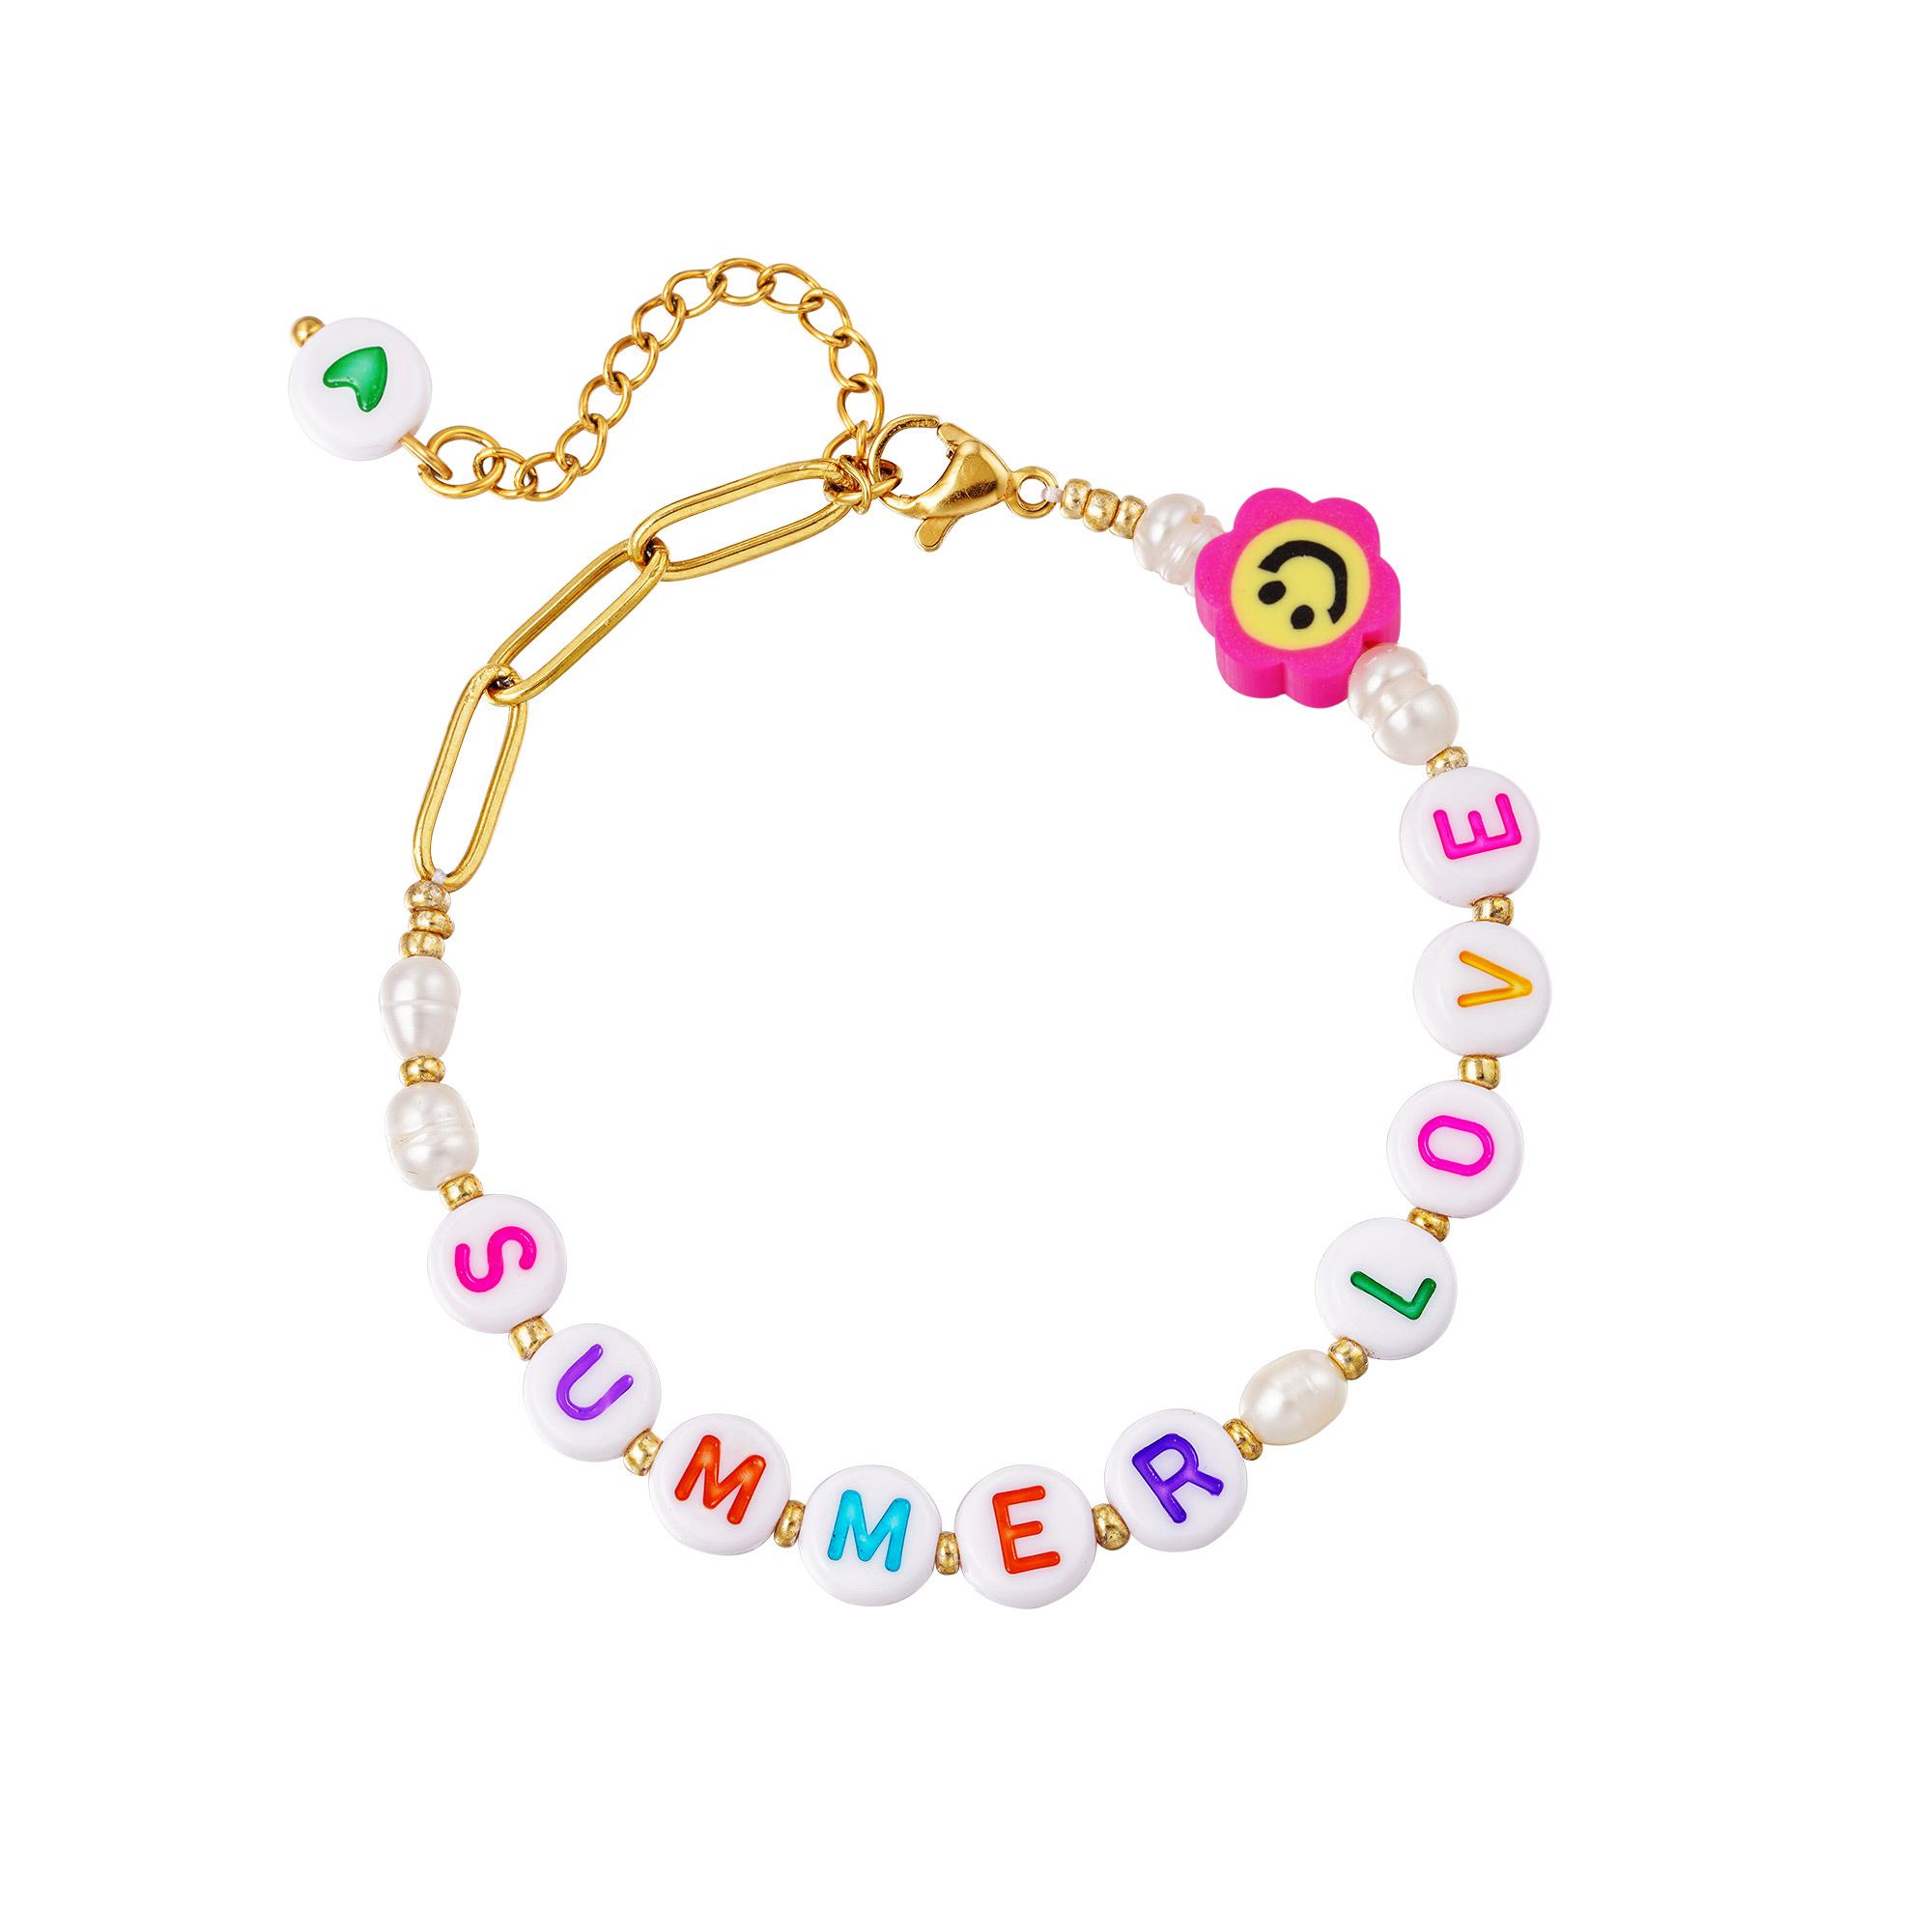 RVS Schakelarmband Summer Love gouden dames armbanden plastic letter blokjes bedel sieraden bracelets kopen bestellen festival yehwang